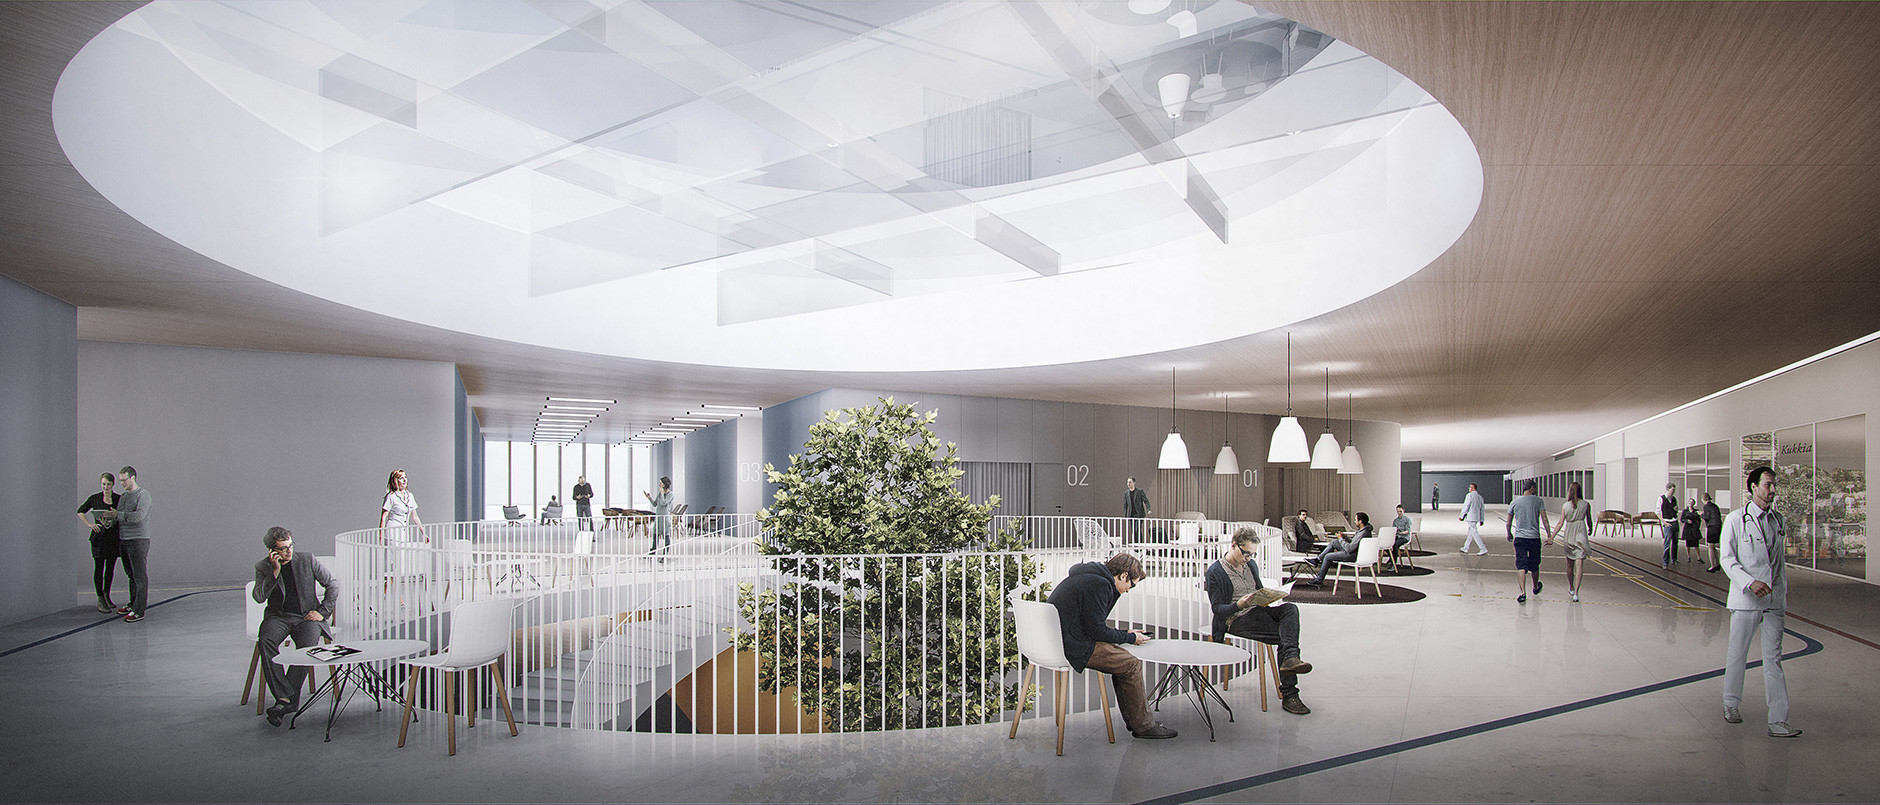 Finland Interior Design School